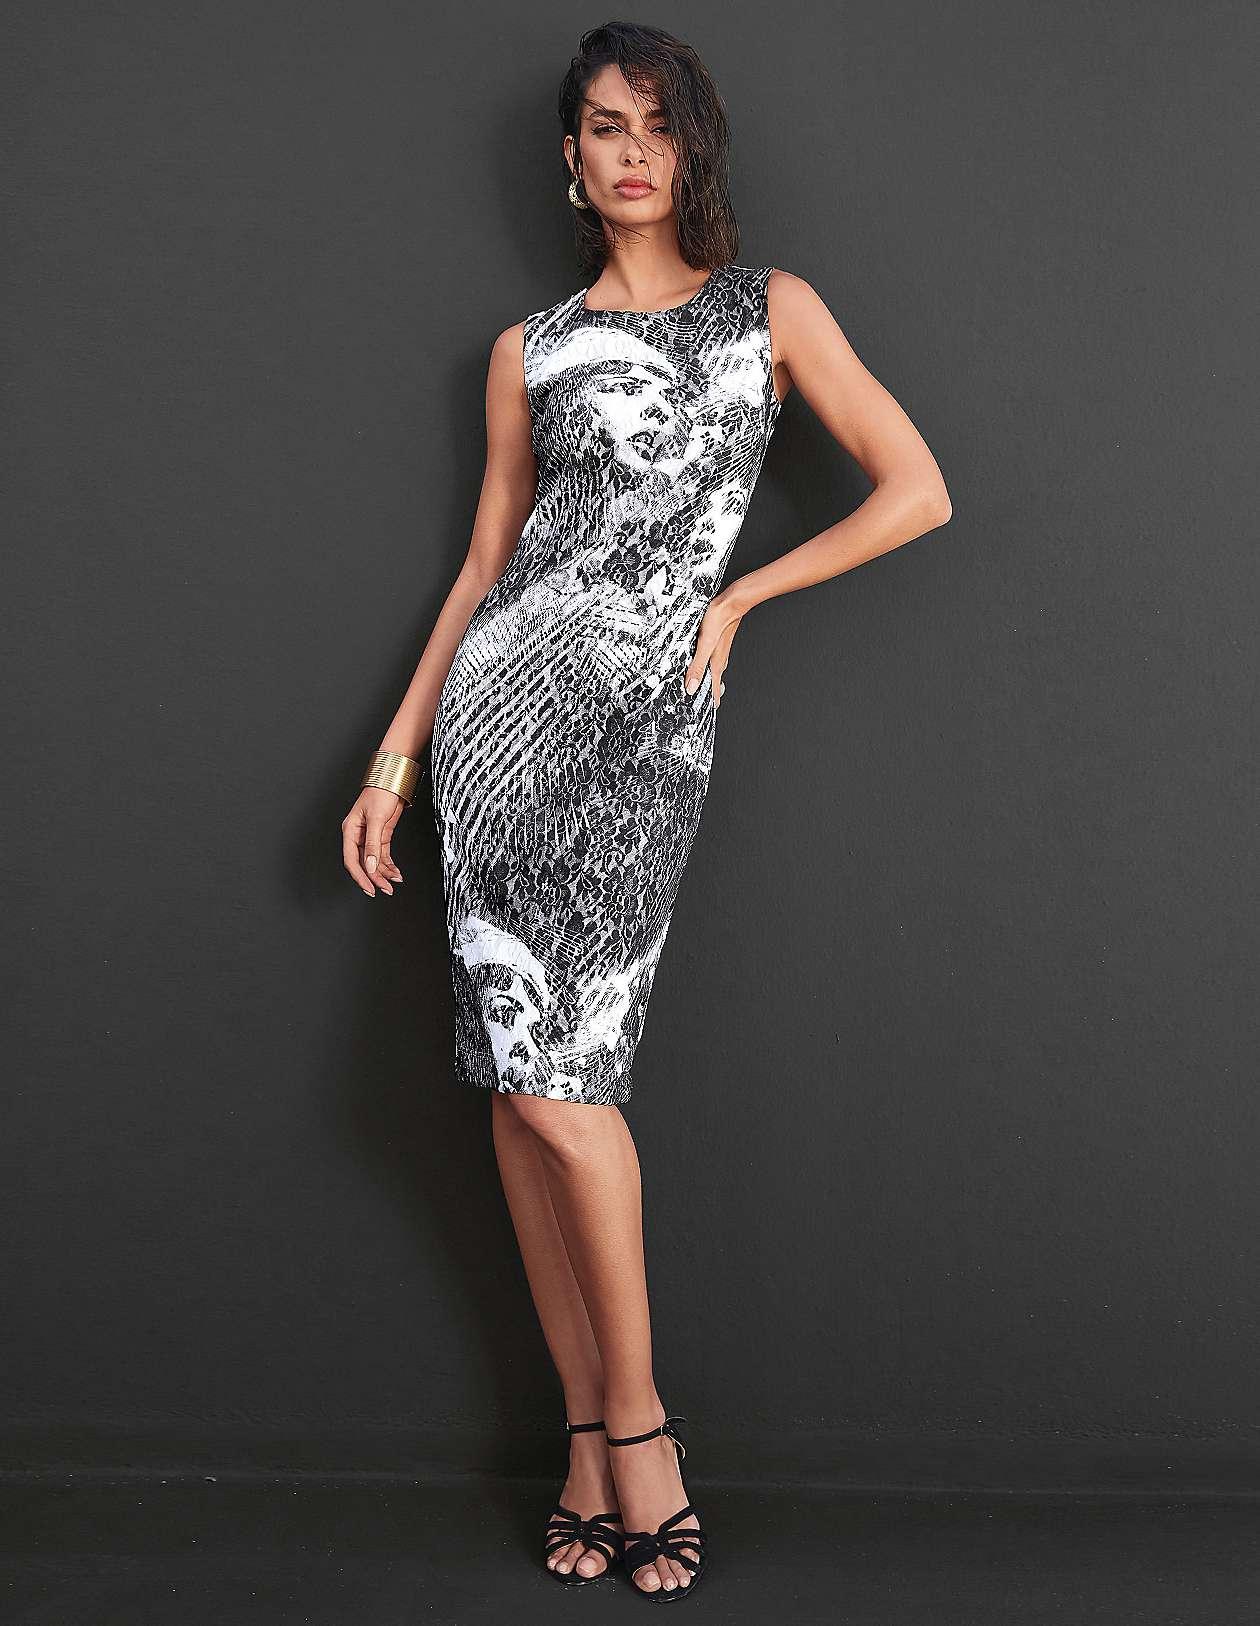 d4a54695d103 Etui-φορέματα | MADELEINE Fashion